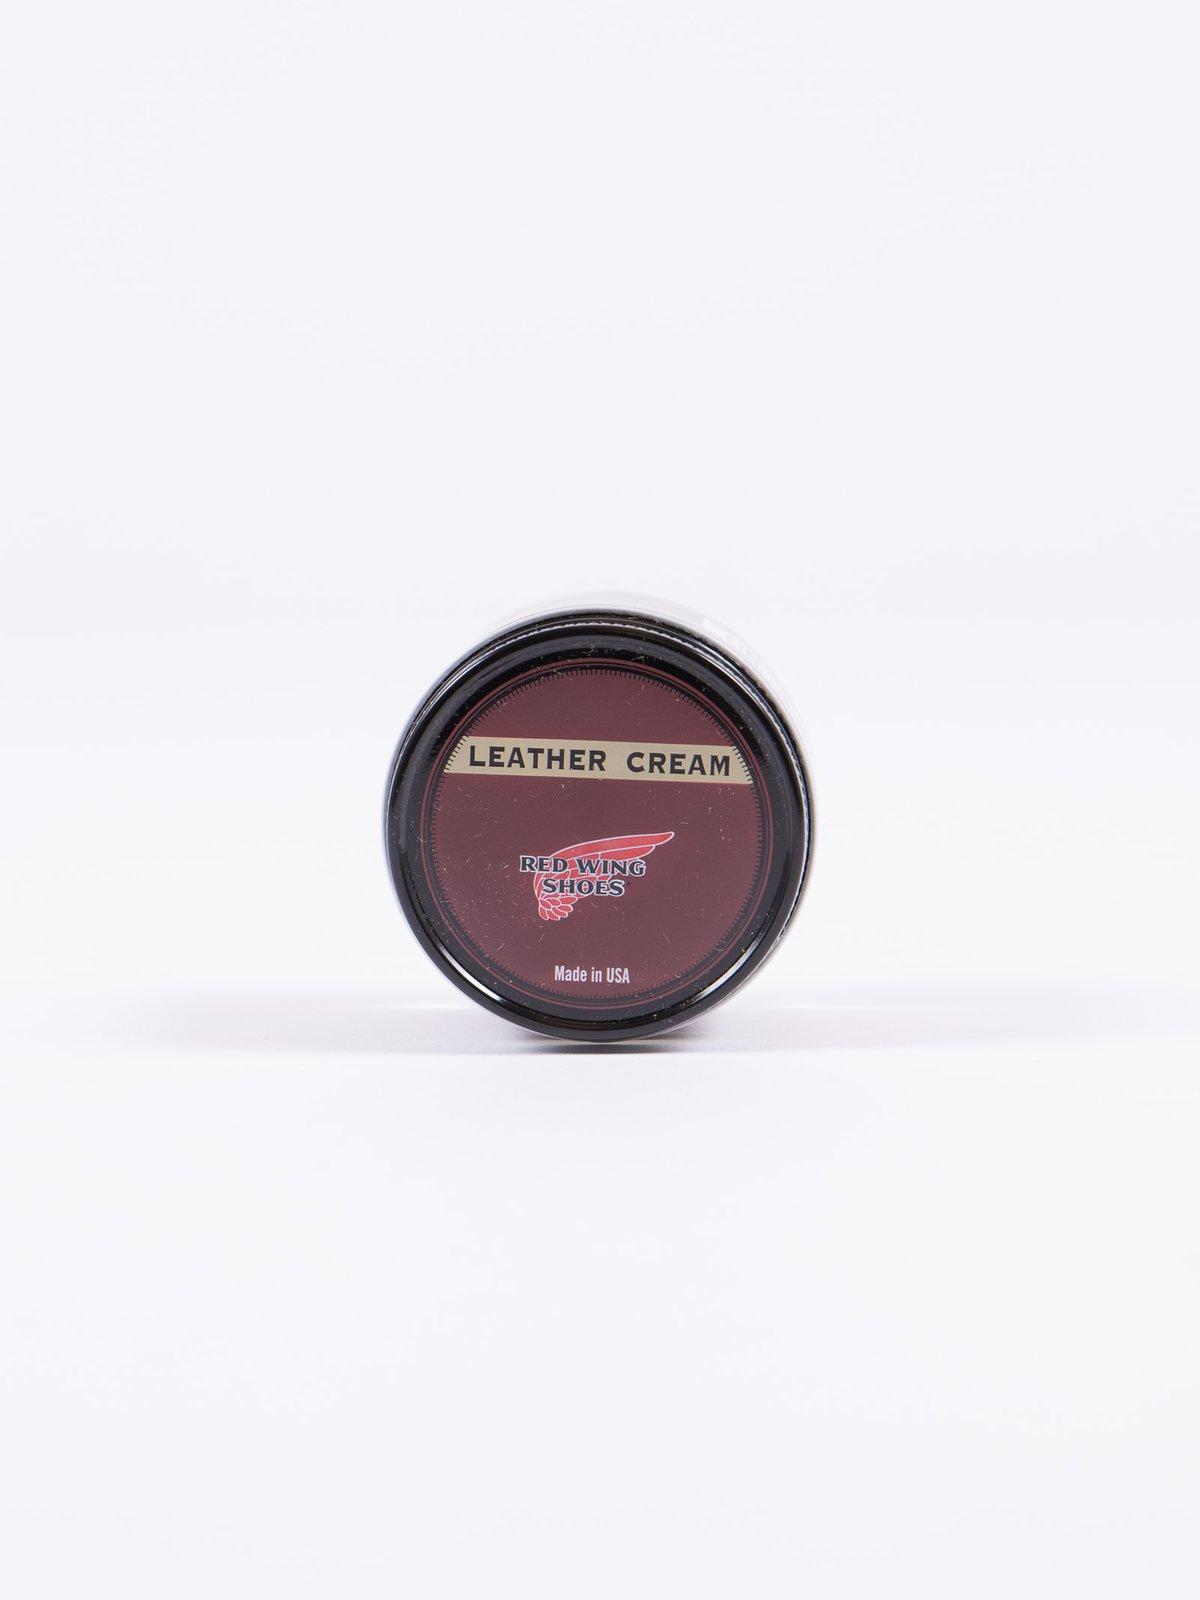 Leather Cream - Image 1